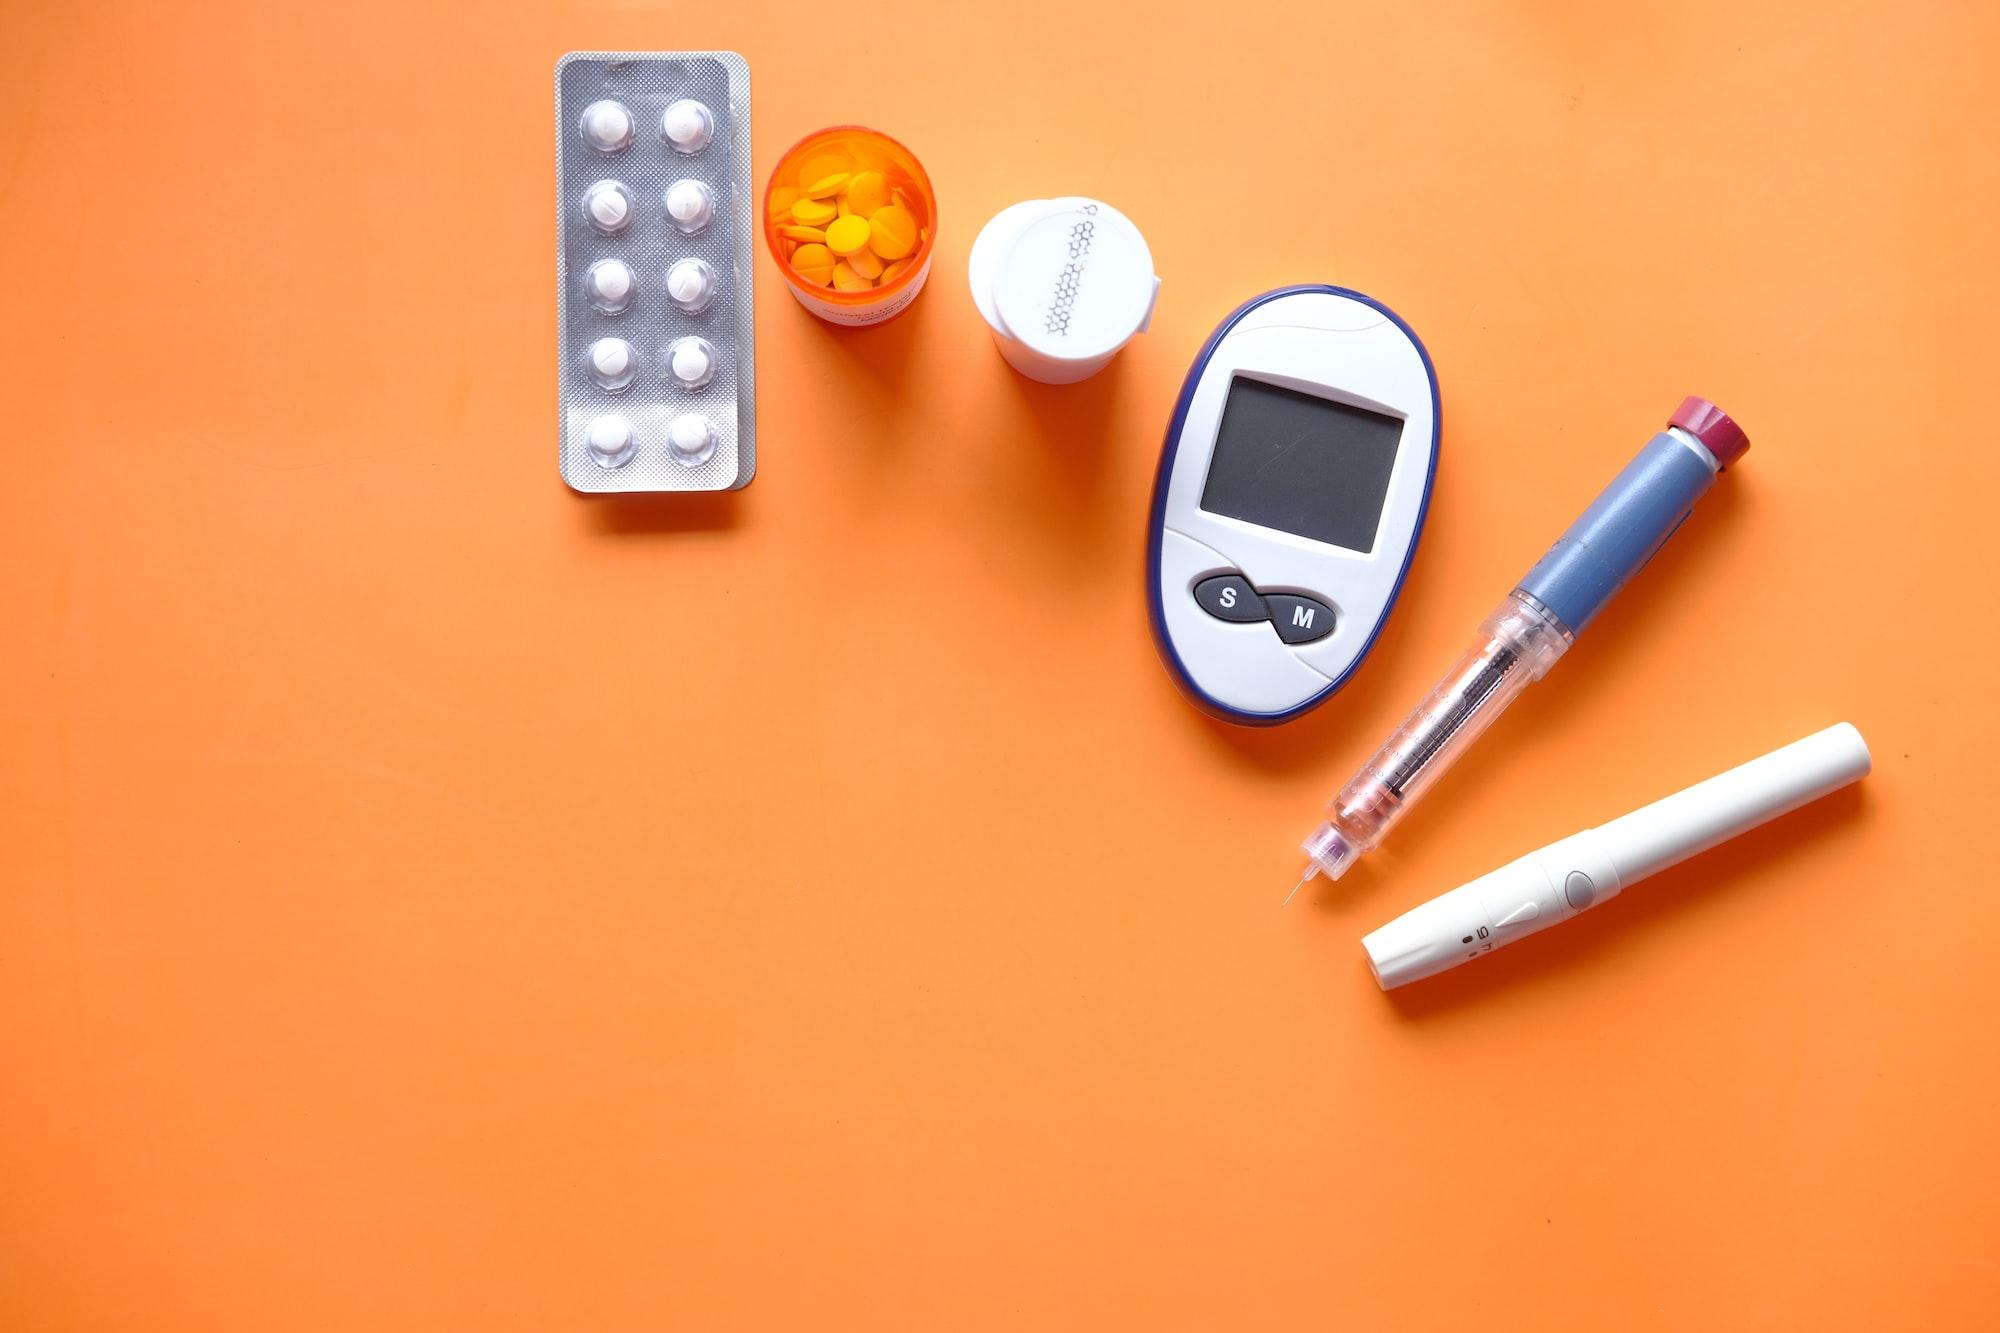 insulin pen, diabetic measurement tools and pills on orange background